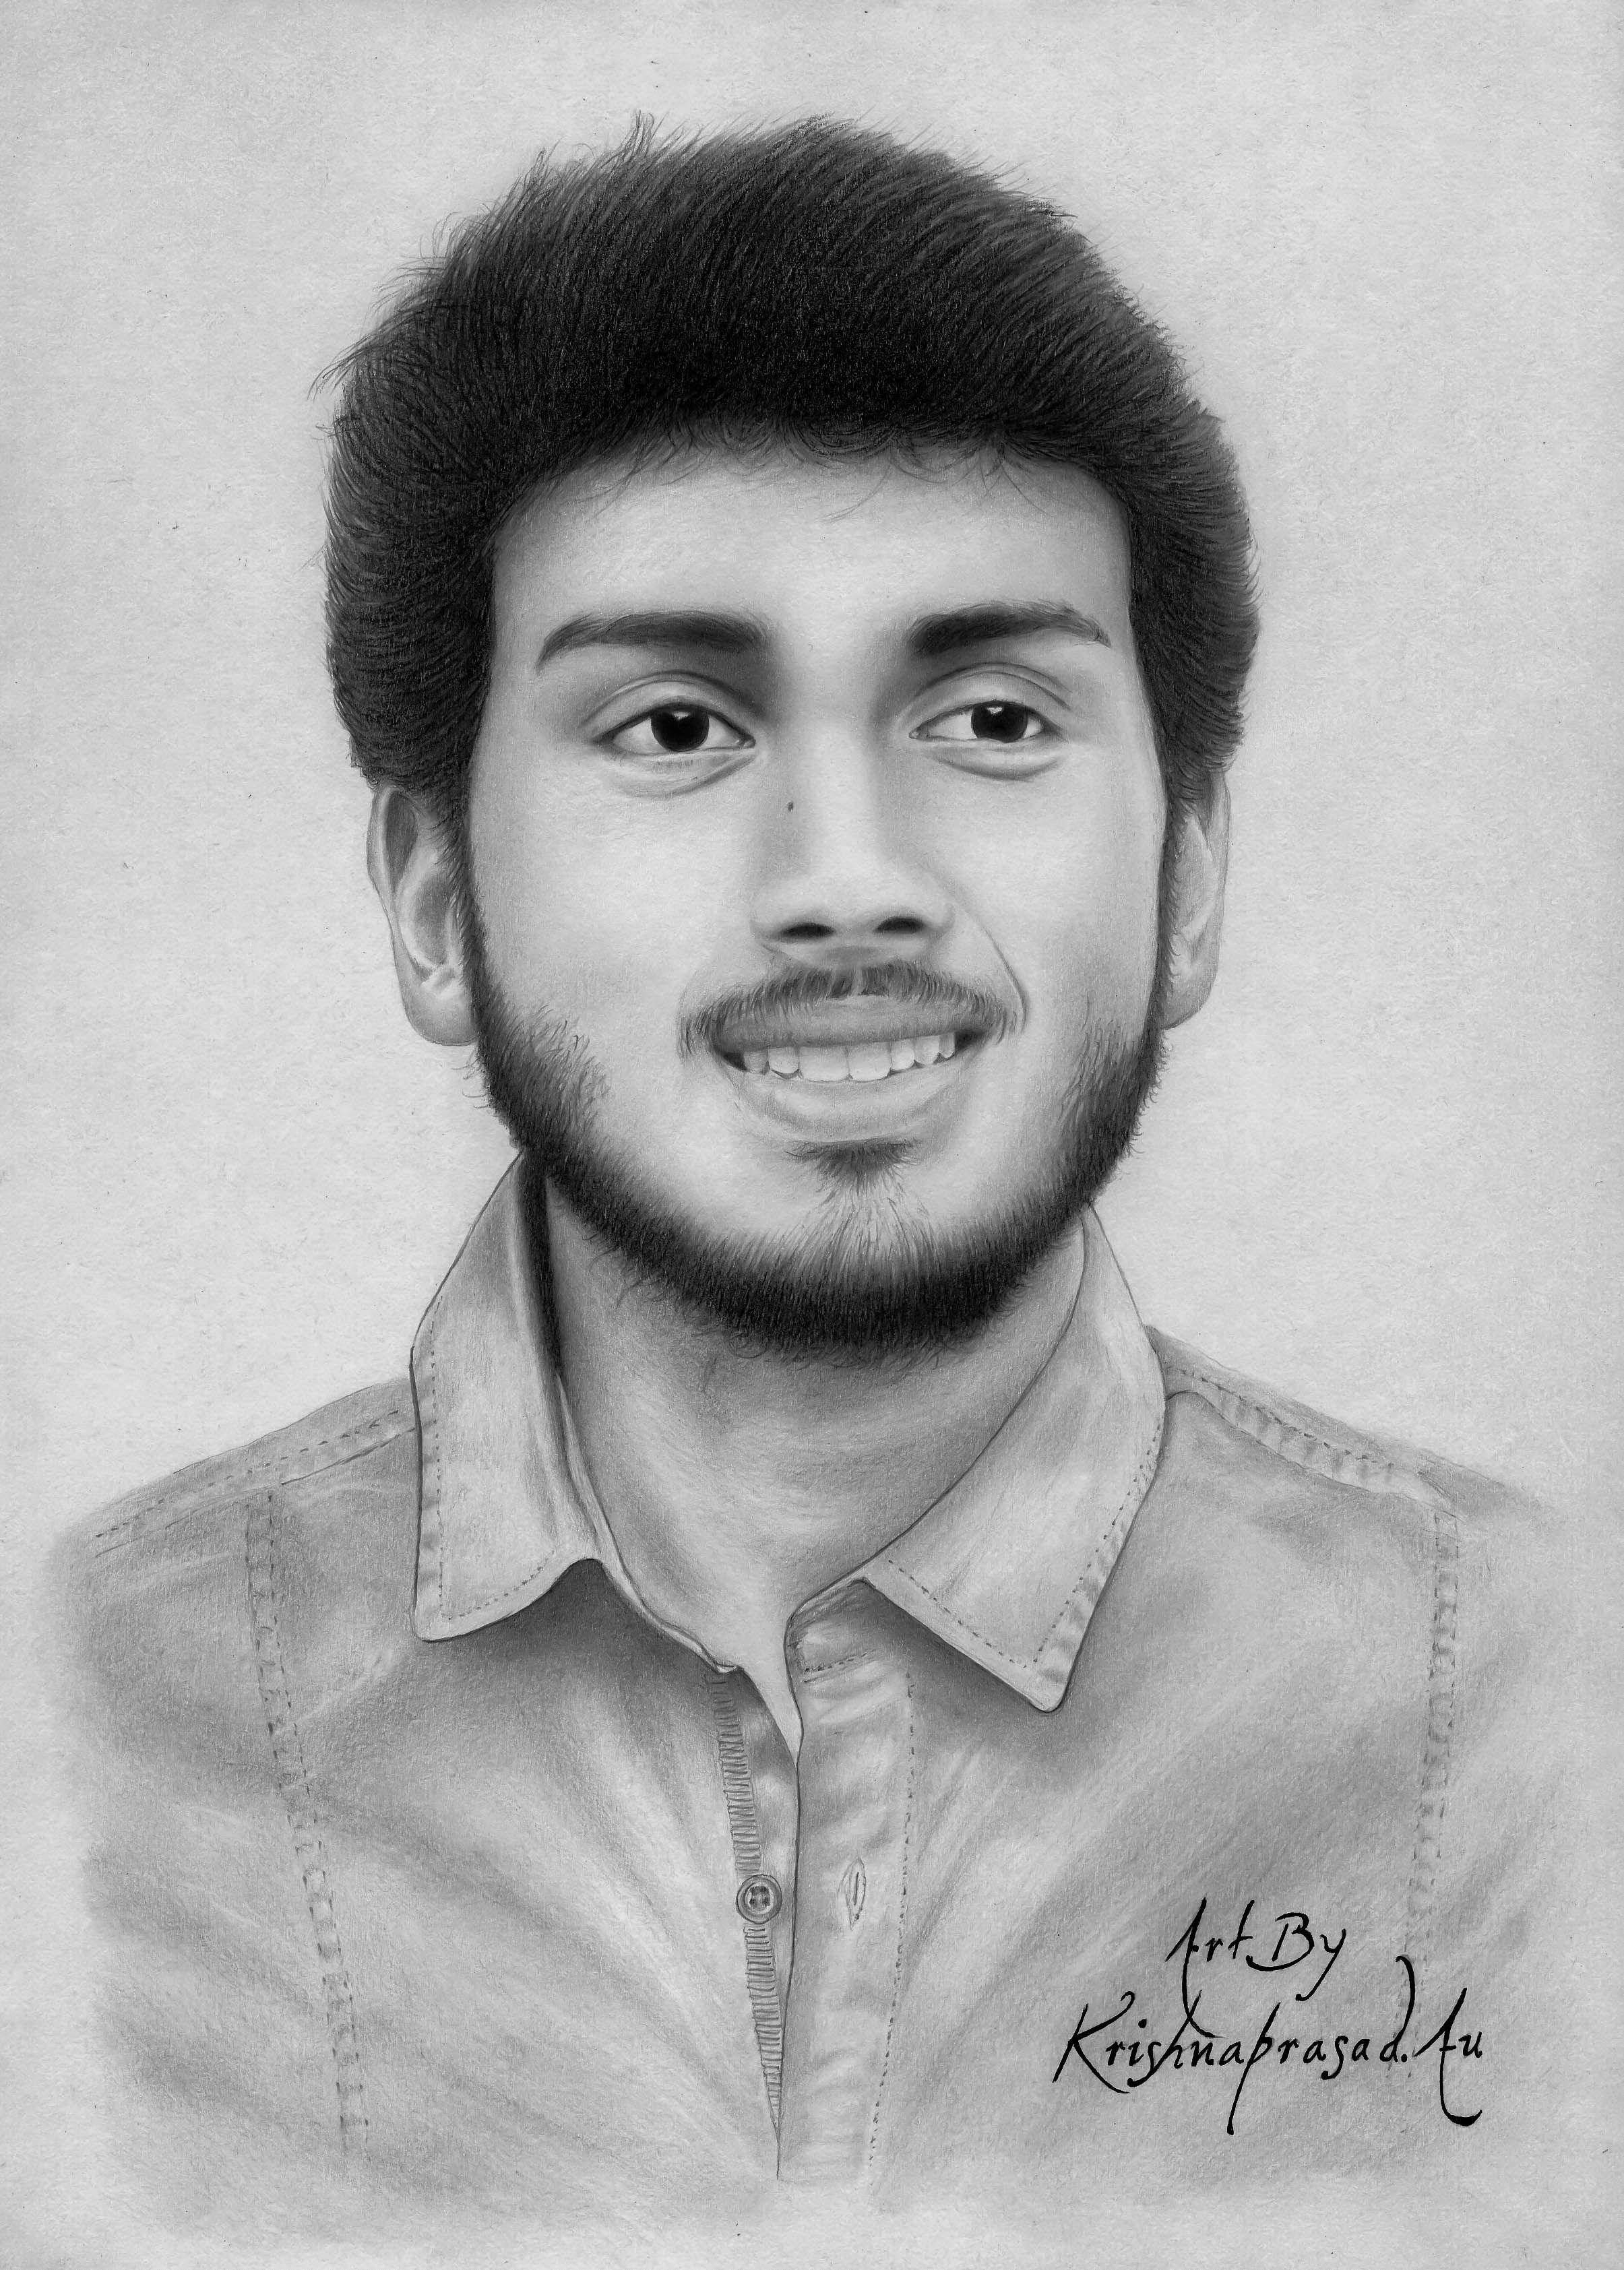 My art work realistic portrait of kalidas jayaram pencils camlin 10b8b2bhhb4h5b size a4 duration 17 hours